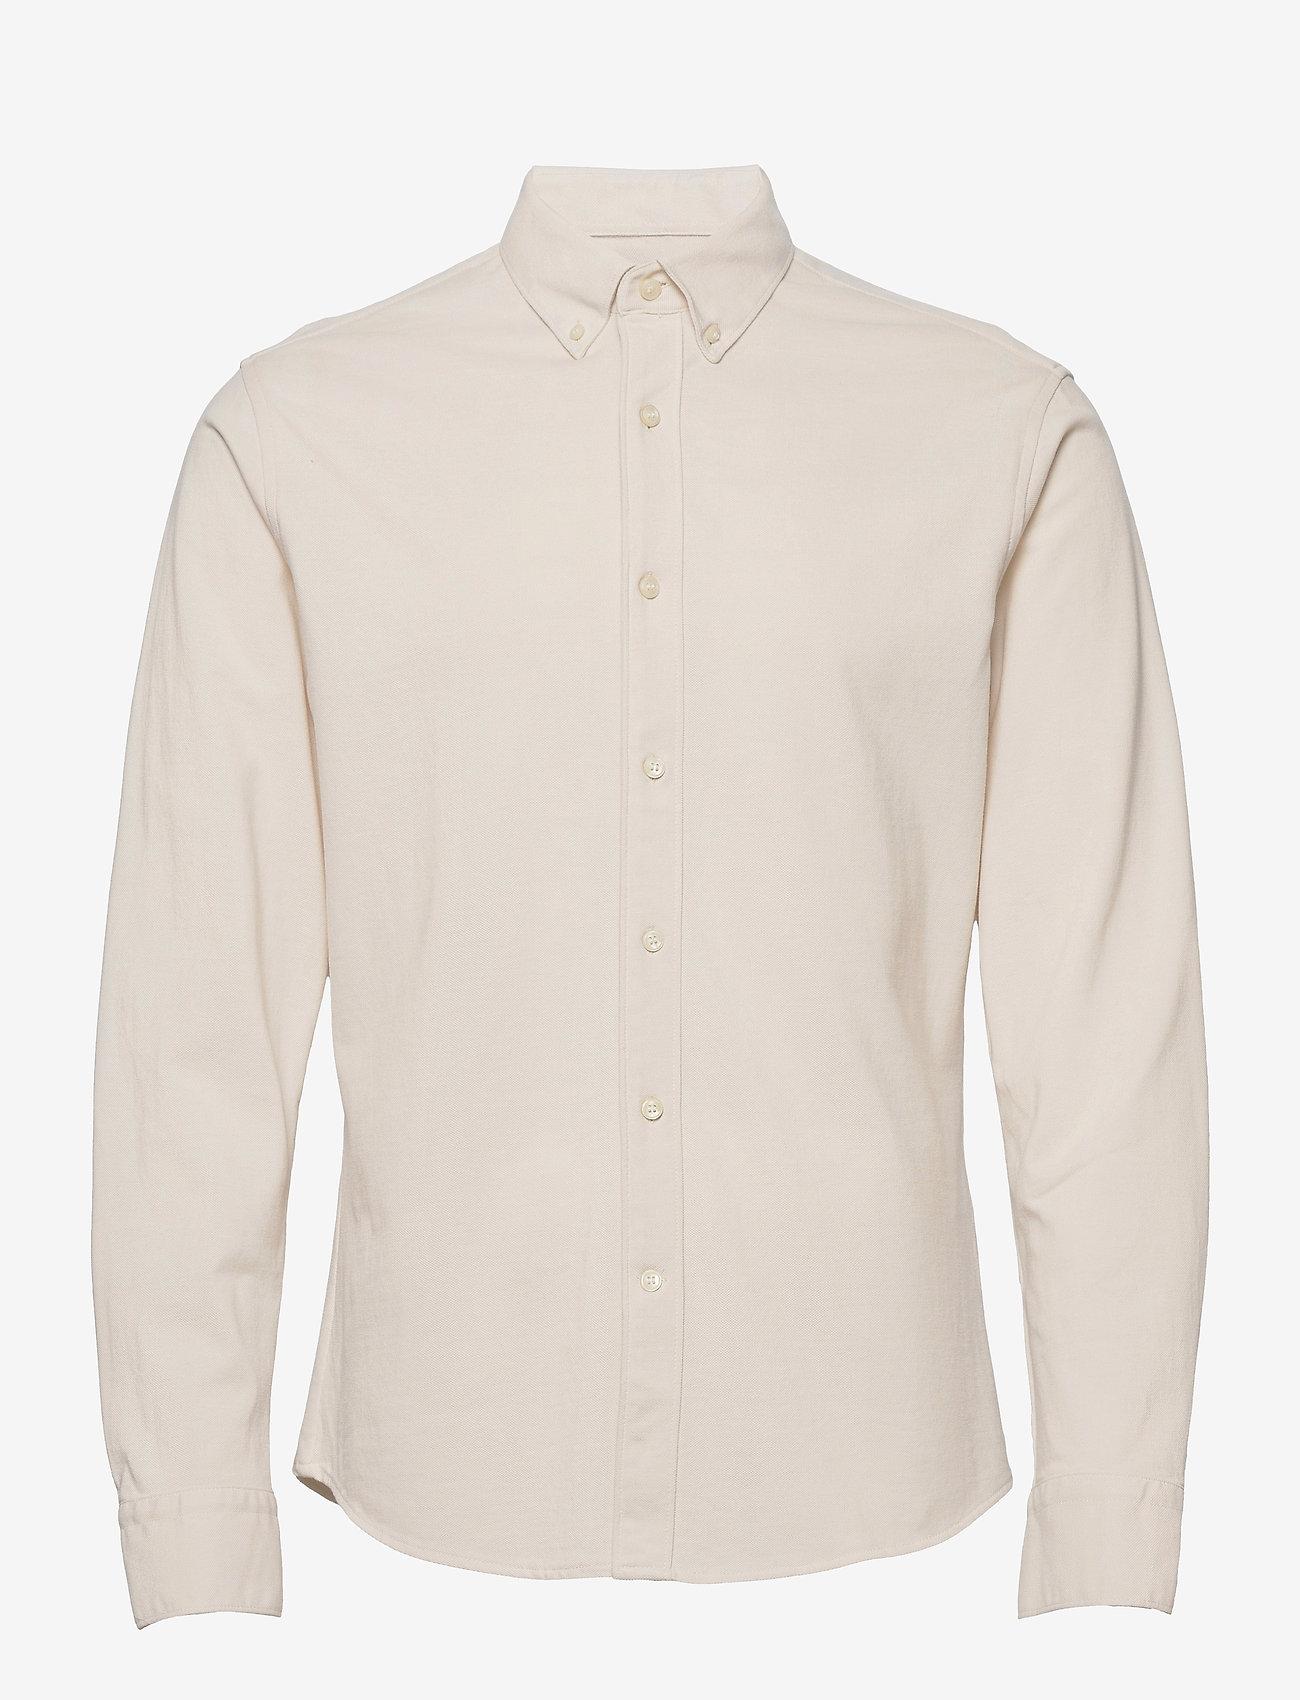 Tiger of Sweden - FENALD - basic skjorter - tinted white - 0